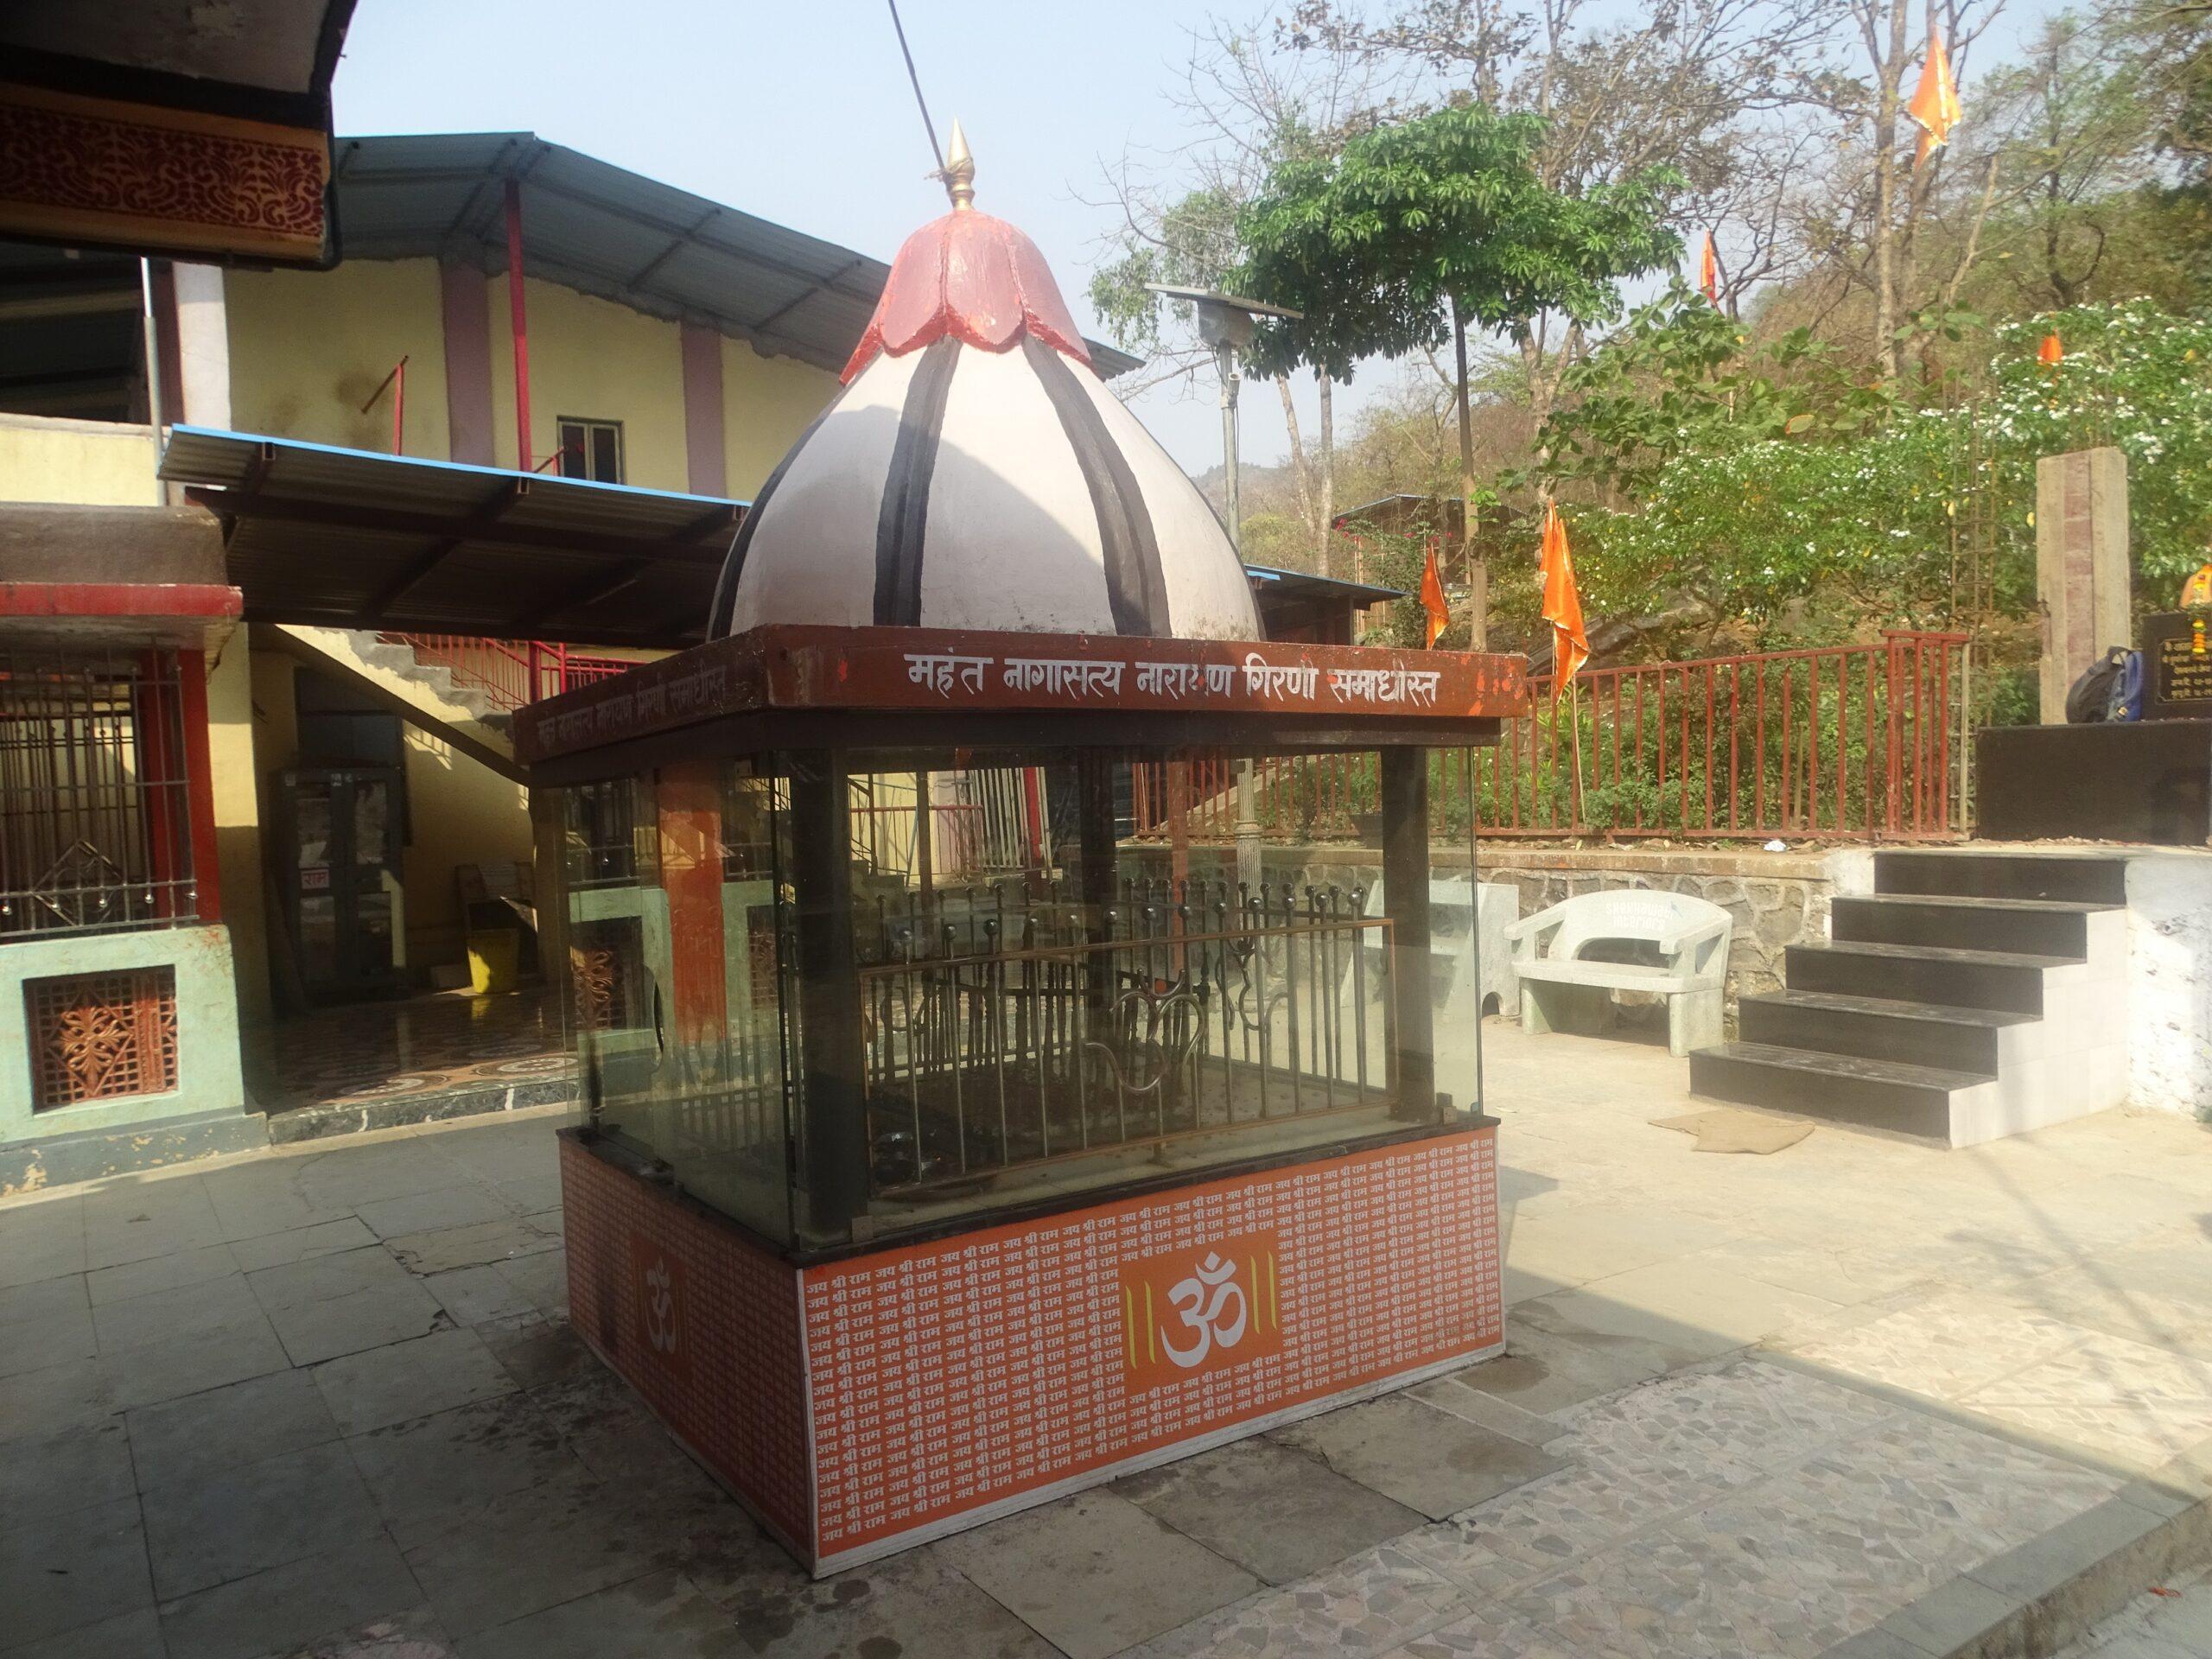 Samadhi of Mahant Nagasatya Narayan Girni at Tungareshwar Temple, Vasai East, Palghar, Maharashtra, India